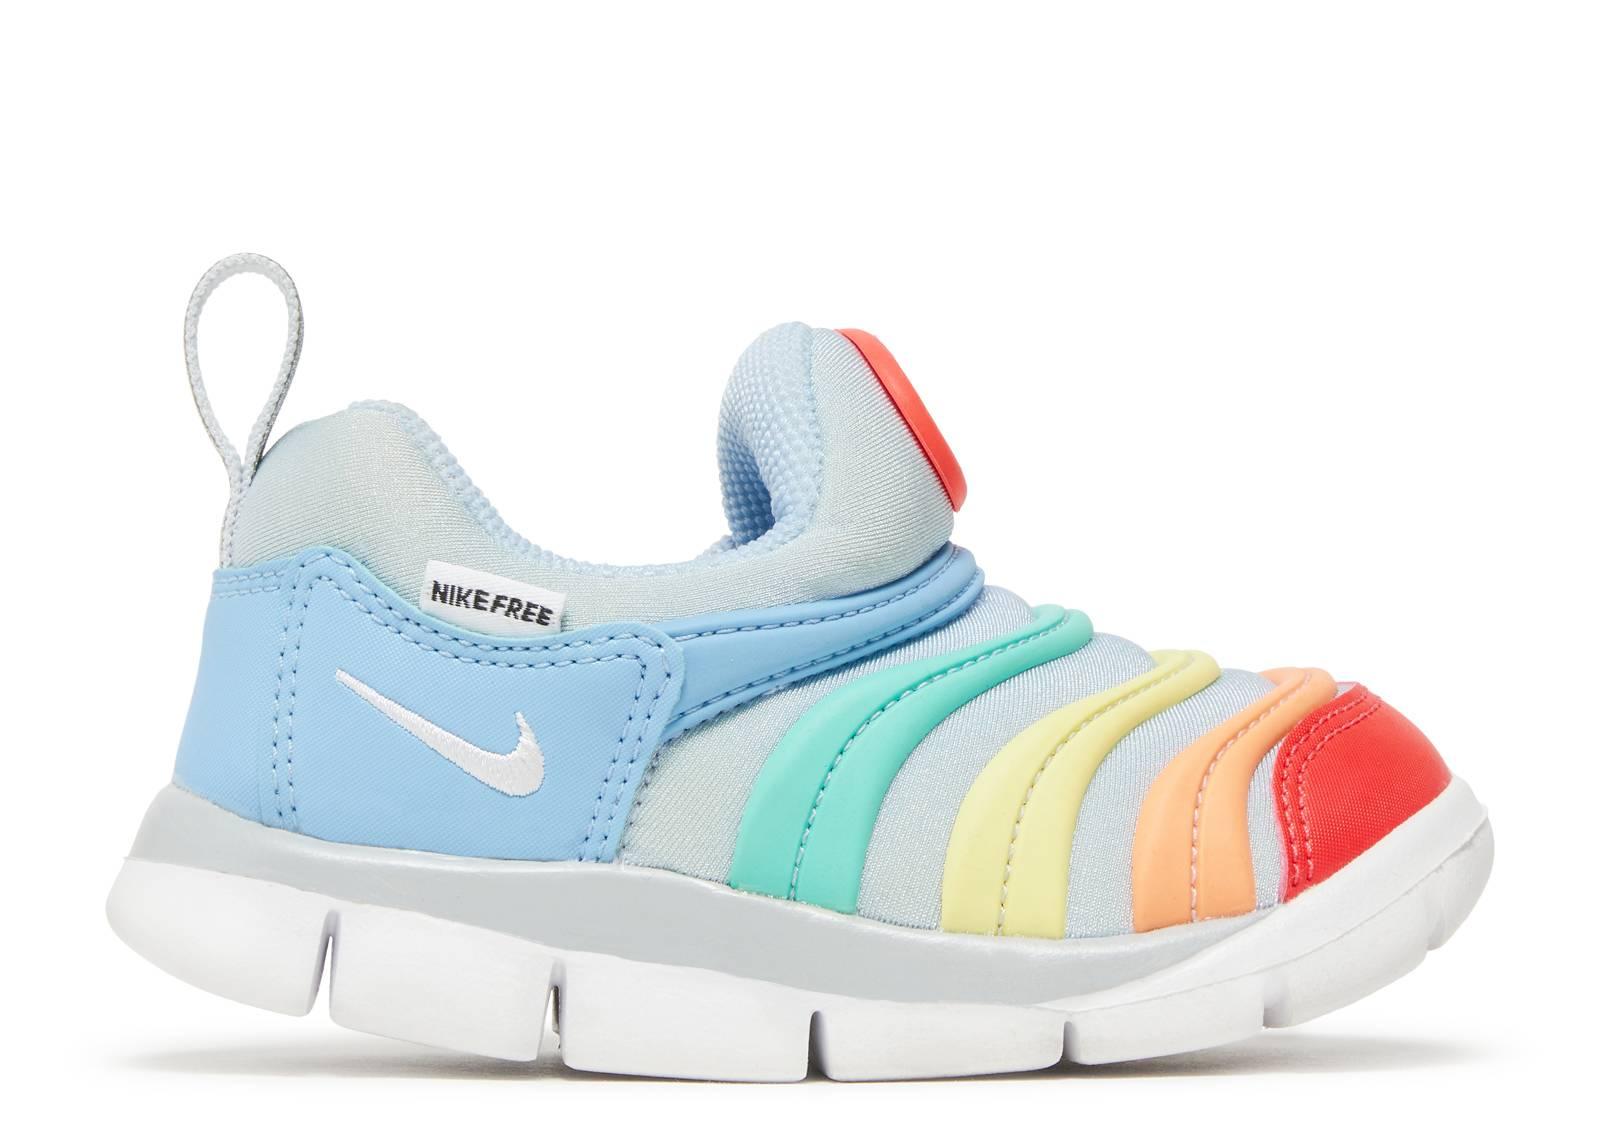 4f10f0b482e1 Nike Dynamo Free (td) - Nike - 343938 425 - royal tint metallic ...